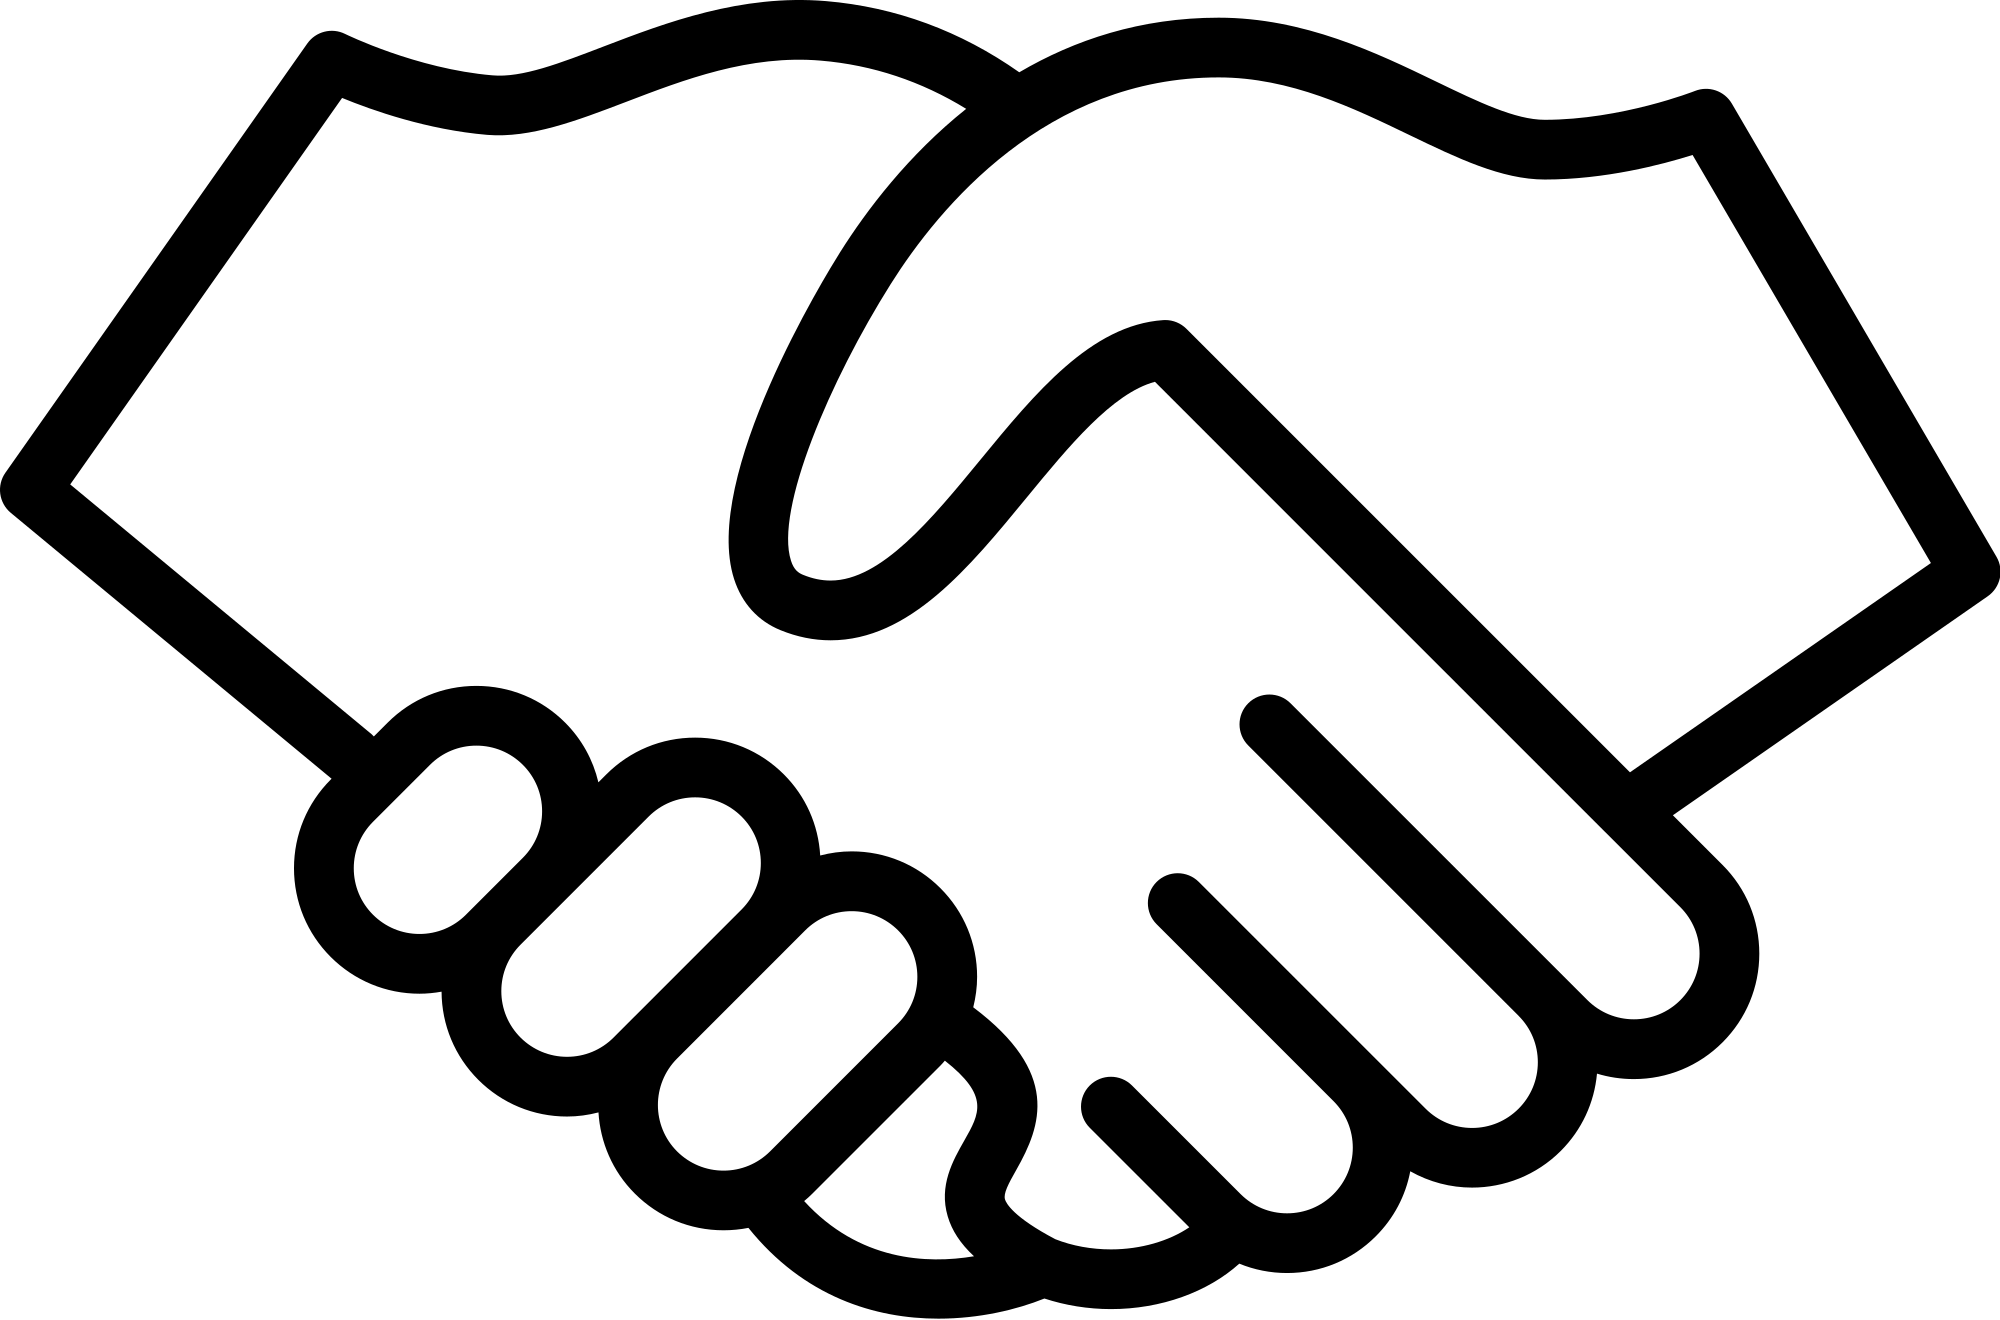 File by david wikimedia. Handshake clipart svg